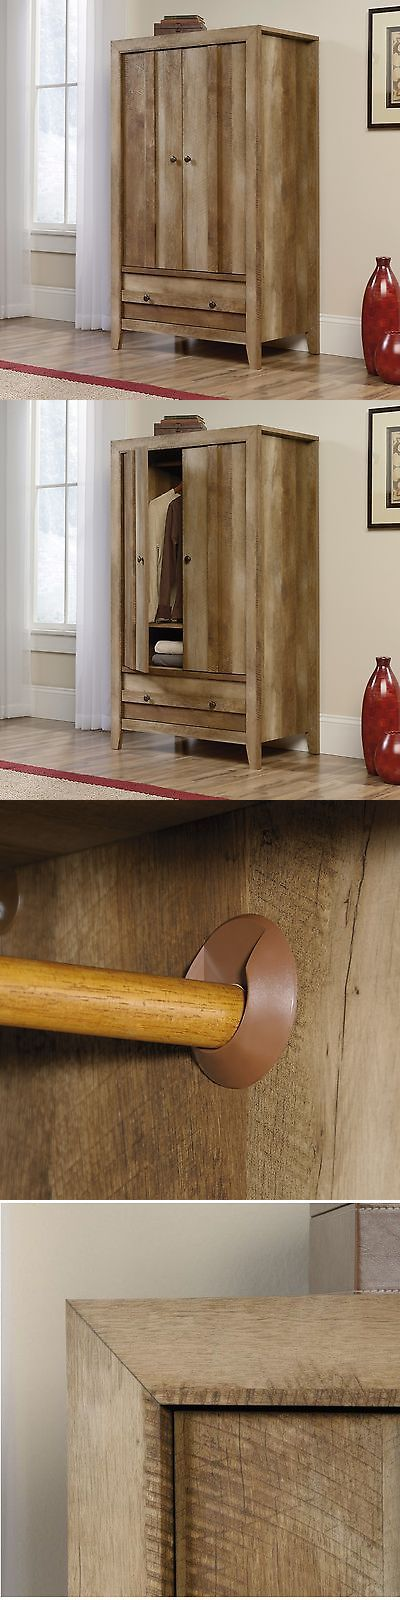 Armoires and Wardrobes 103430: Armoire Craftsman Oak Finish Wardrobe Closet Storage Adjustable Shelf Drawer -> BUY IT NOW ONLY: $299.99 on eBay!